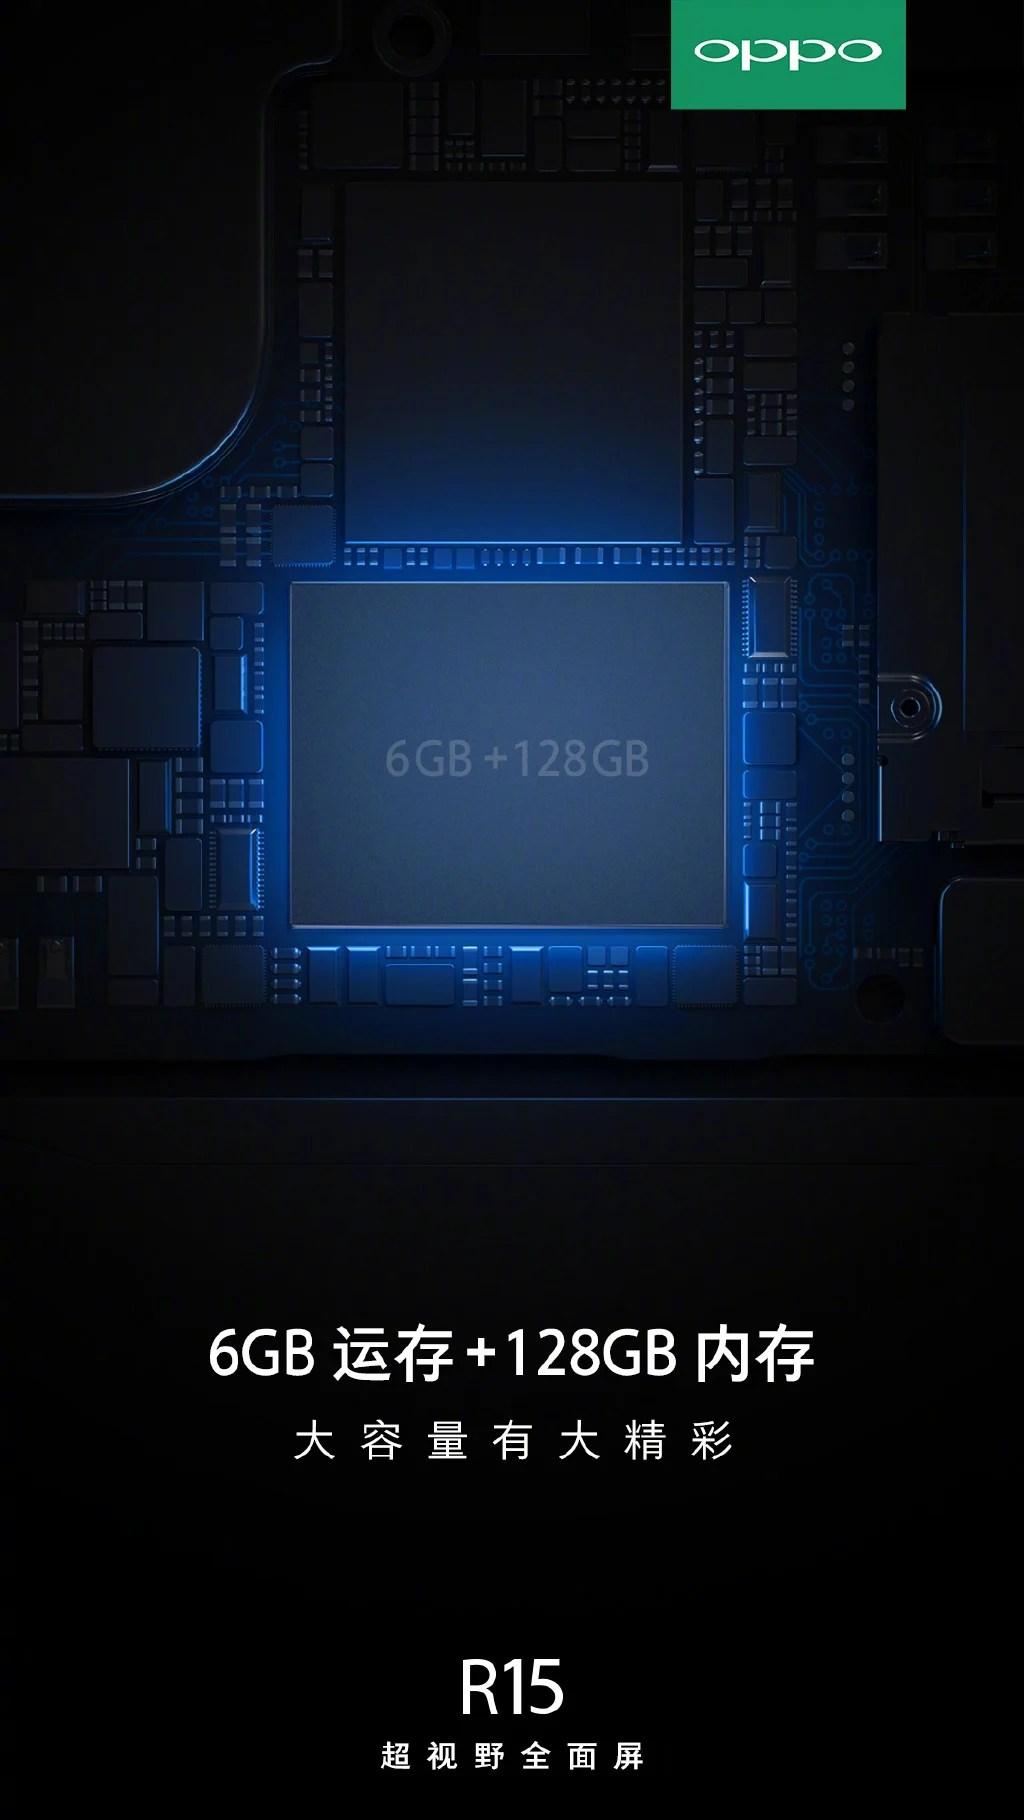 Latest OPPO R15 Teaser Confirms 6GB RAM and 128GB Storage - Gizmochina